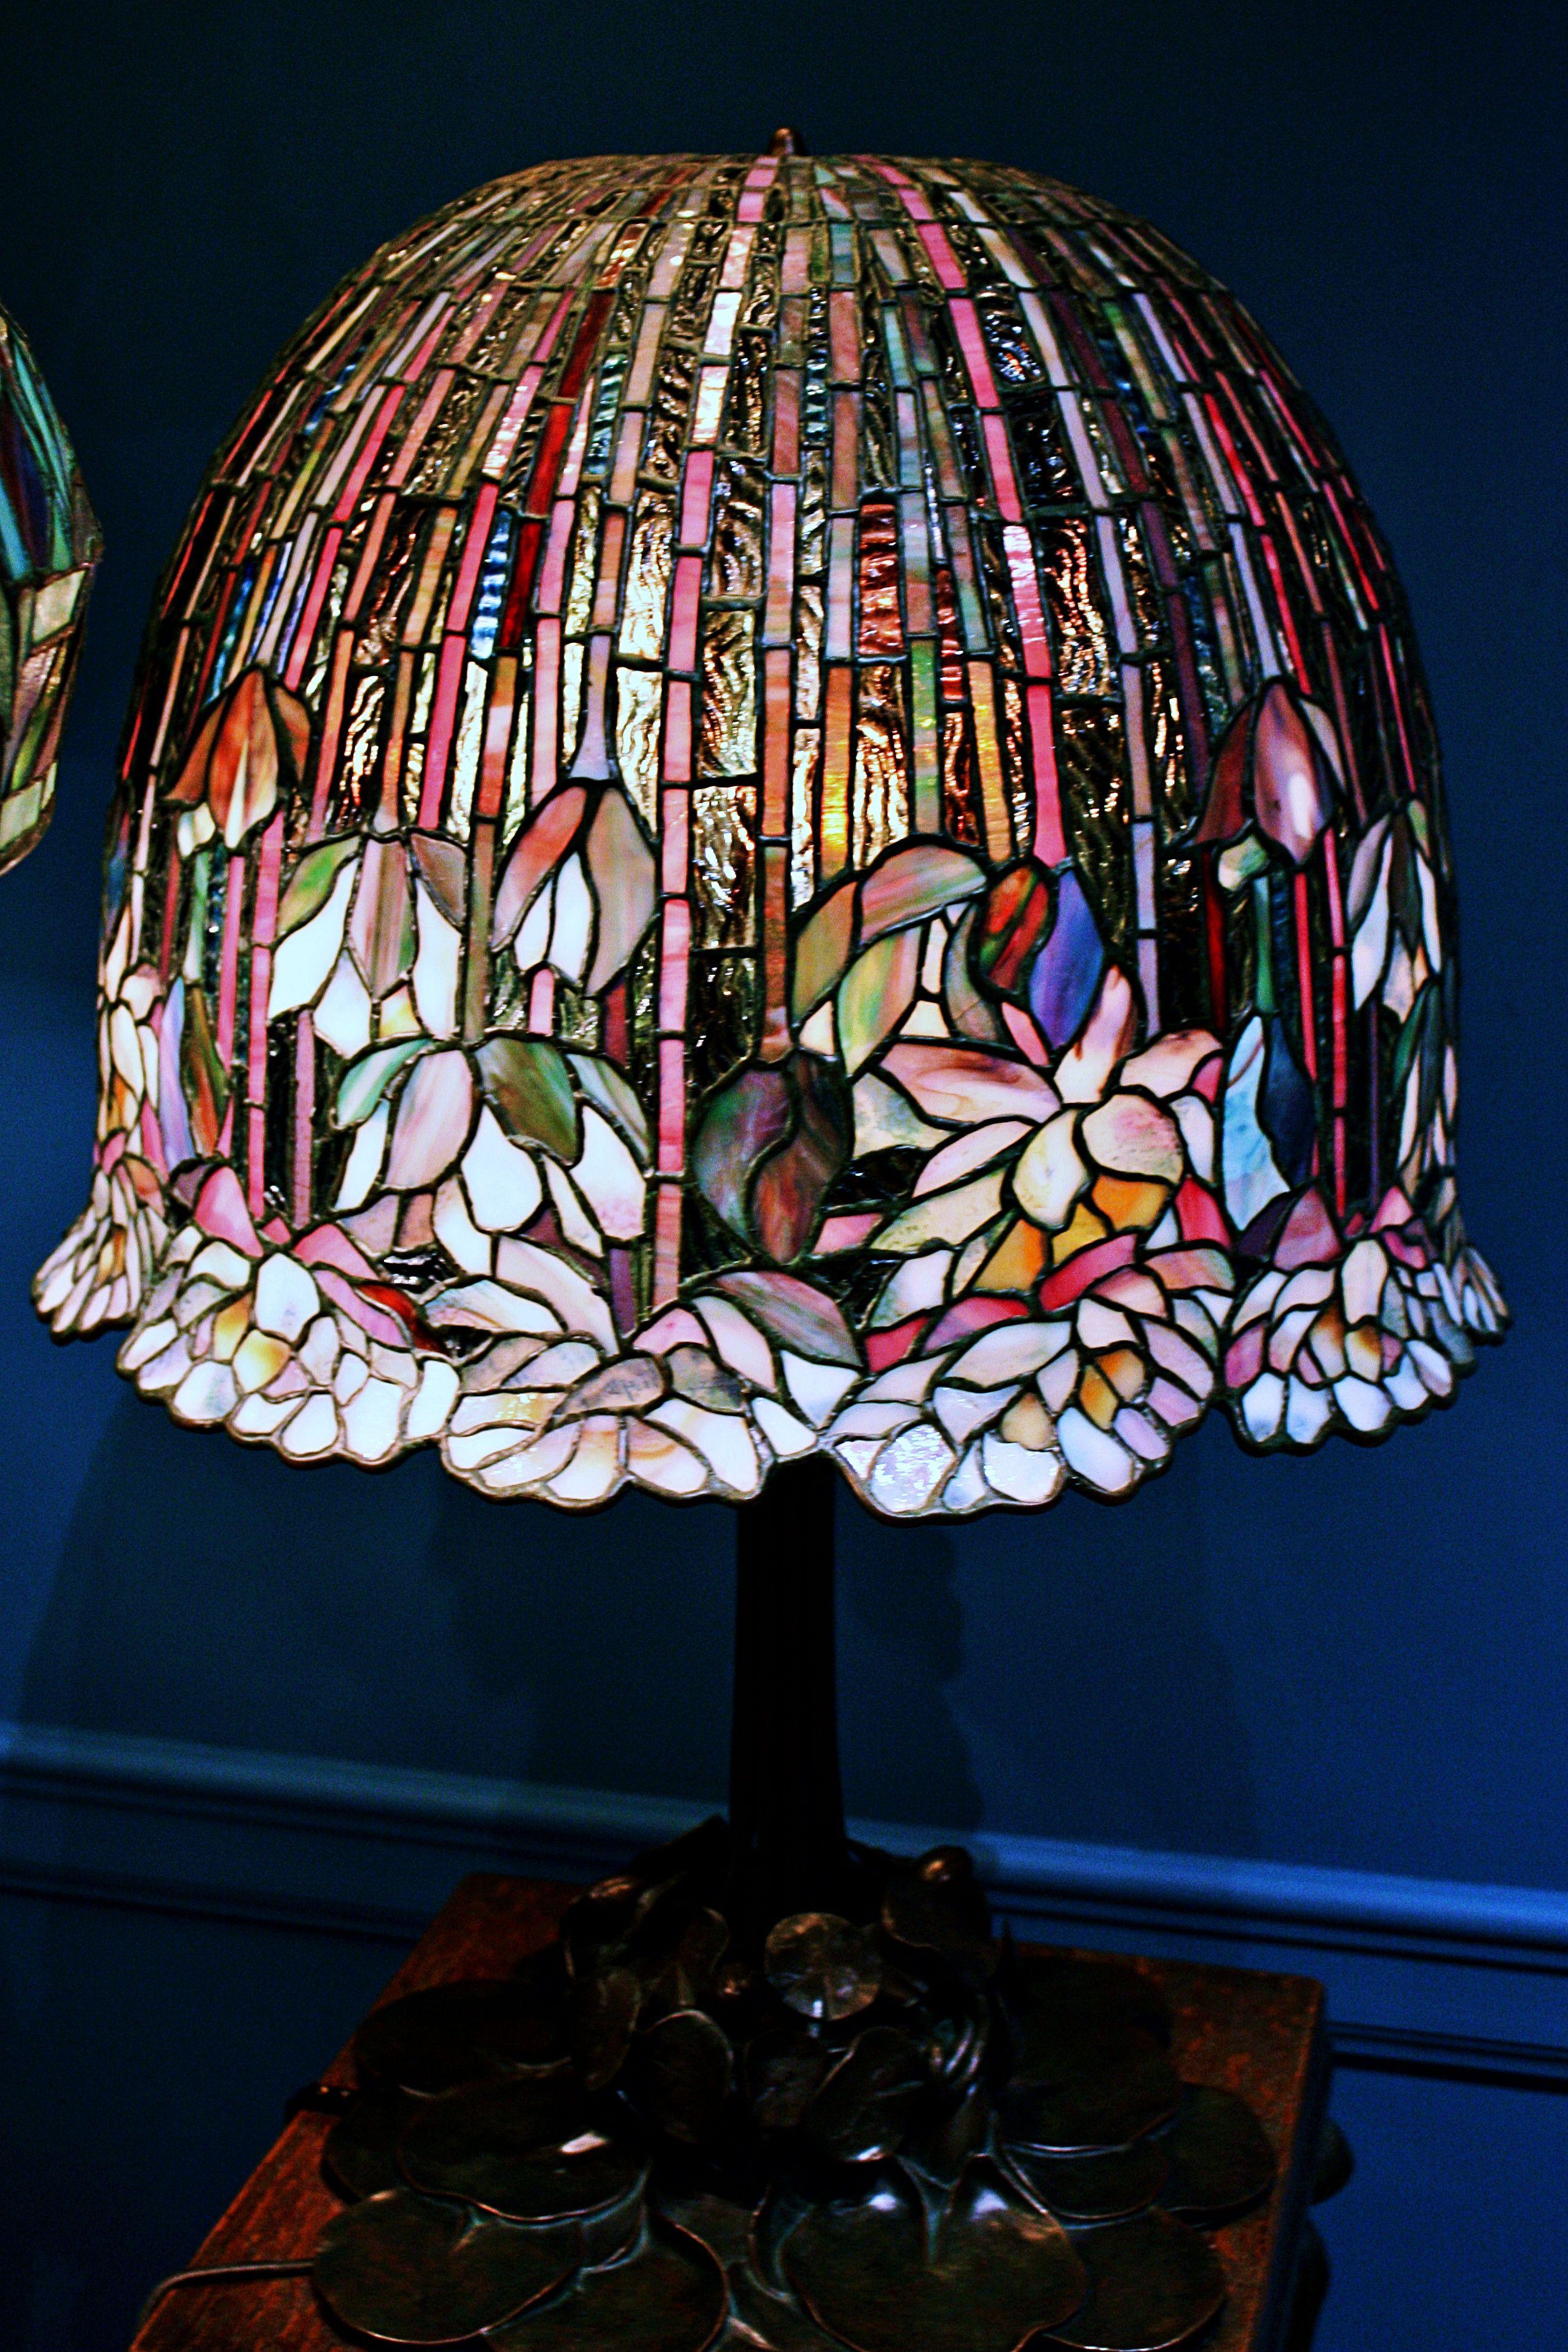 Tall Slim Lamp Table You Need A Bedsidetablelamps Batterytablelamp Tablelampsforbedroom Floorlampshades Lamp Design Table Lamp Lamp